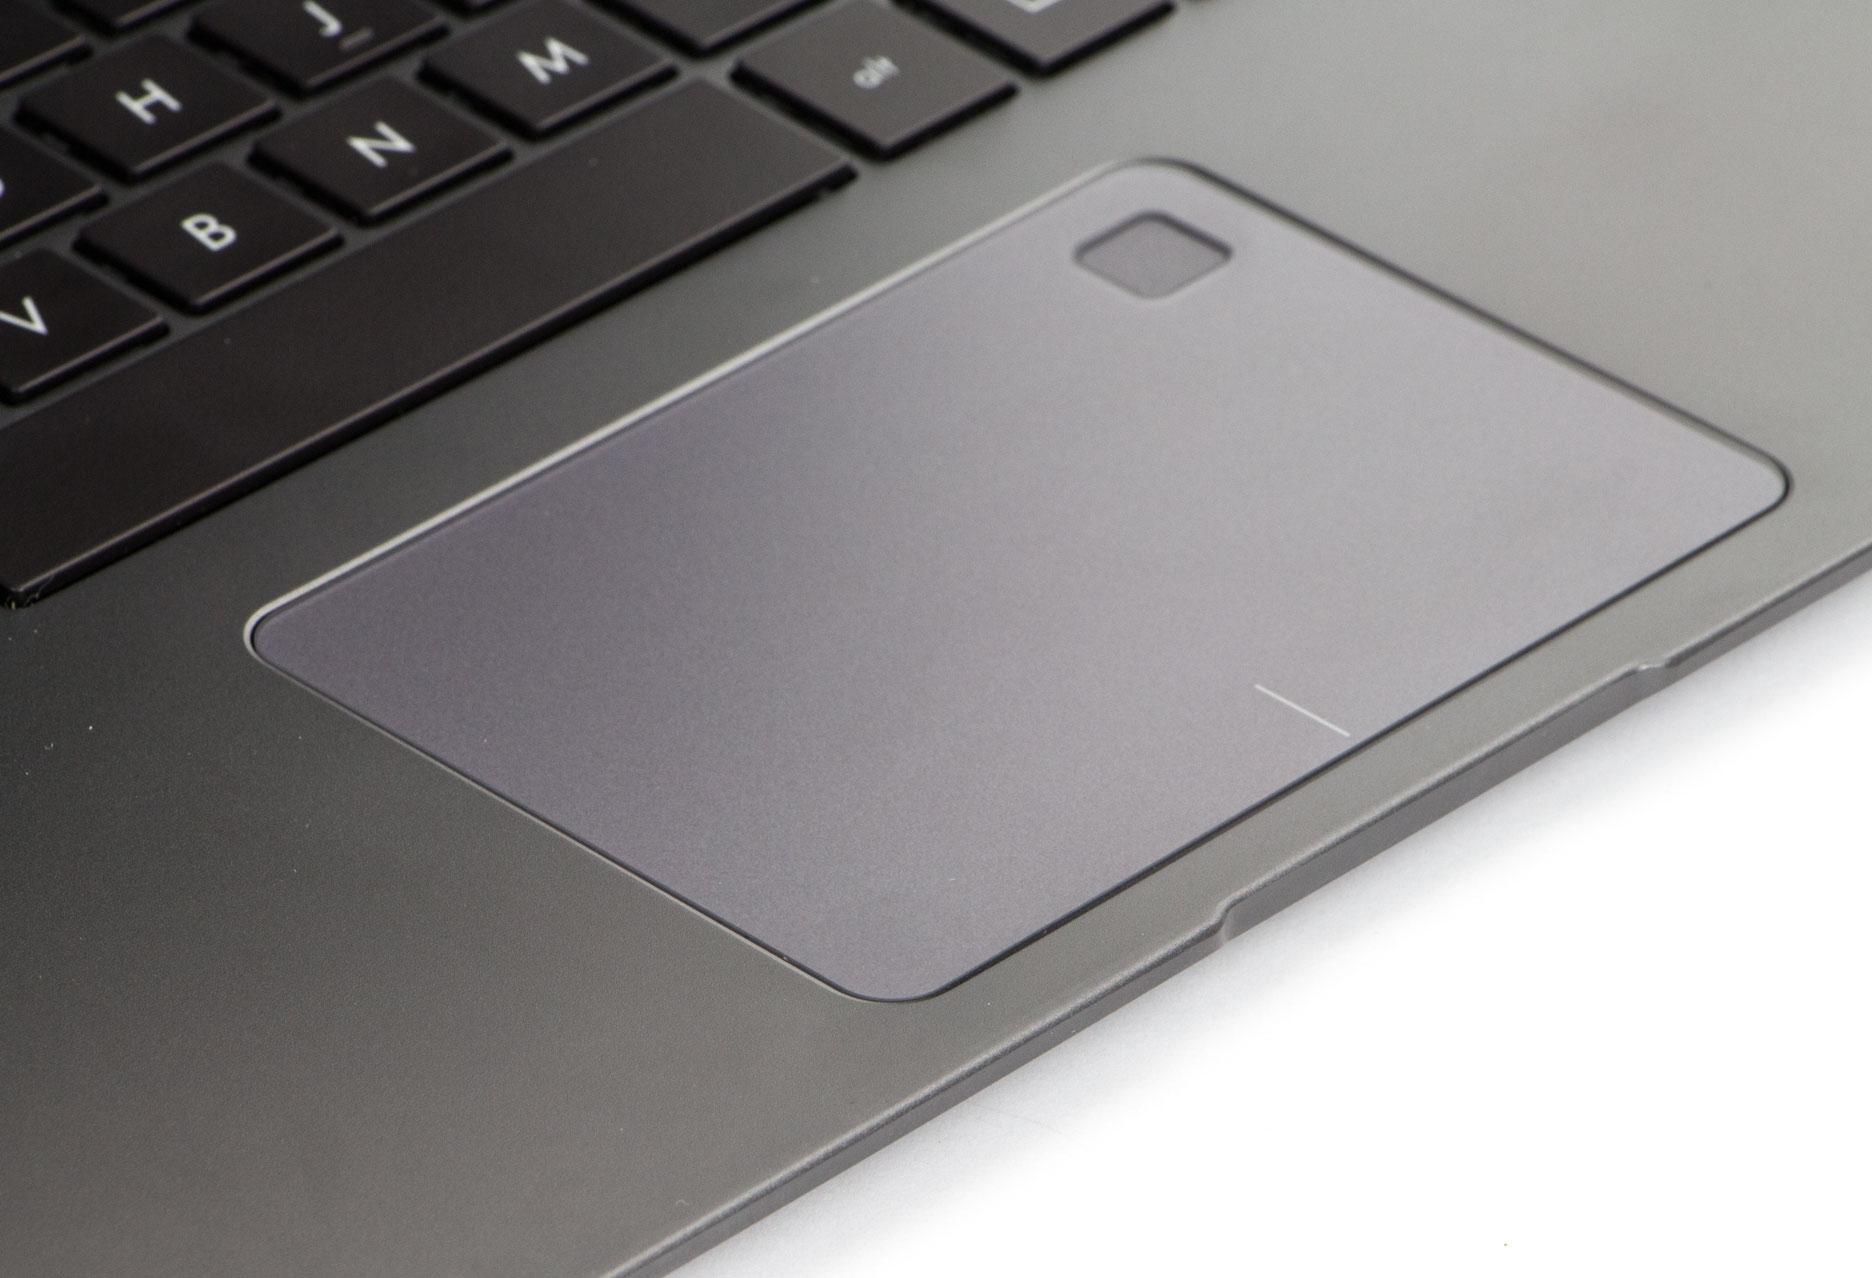 Asus Zenbook UX430U touchpad